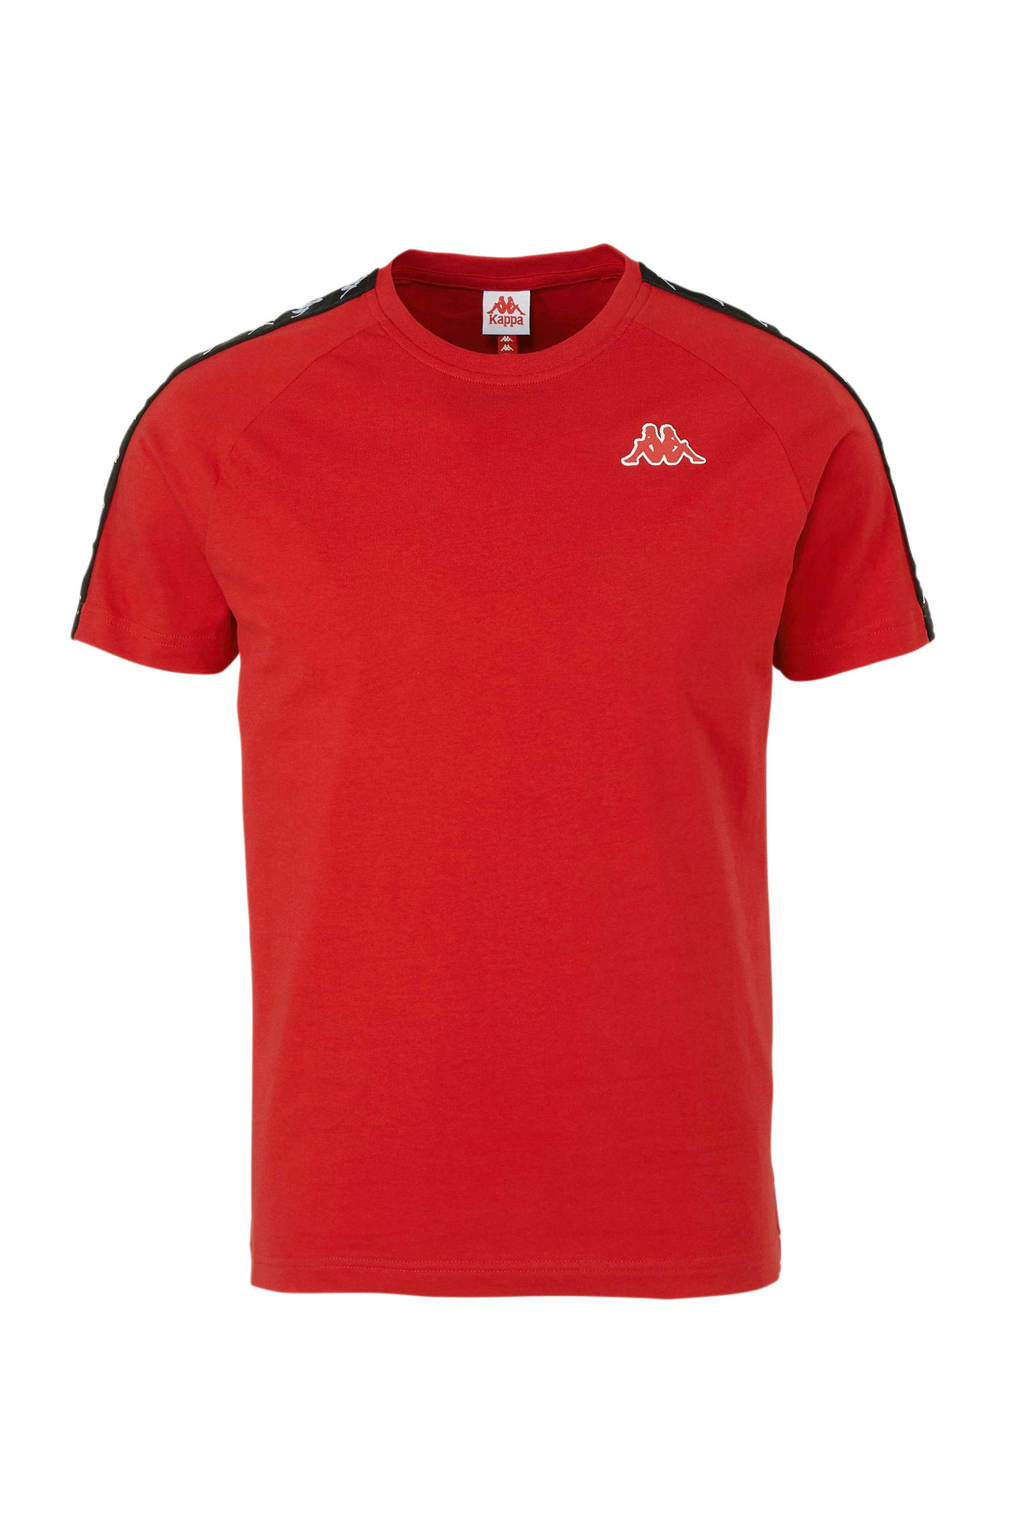 Kappa   T-shirt met contrastbies rood/zwart, Rood/zwart